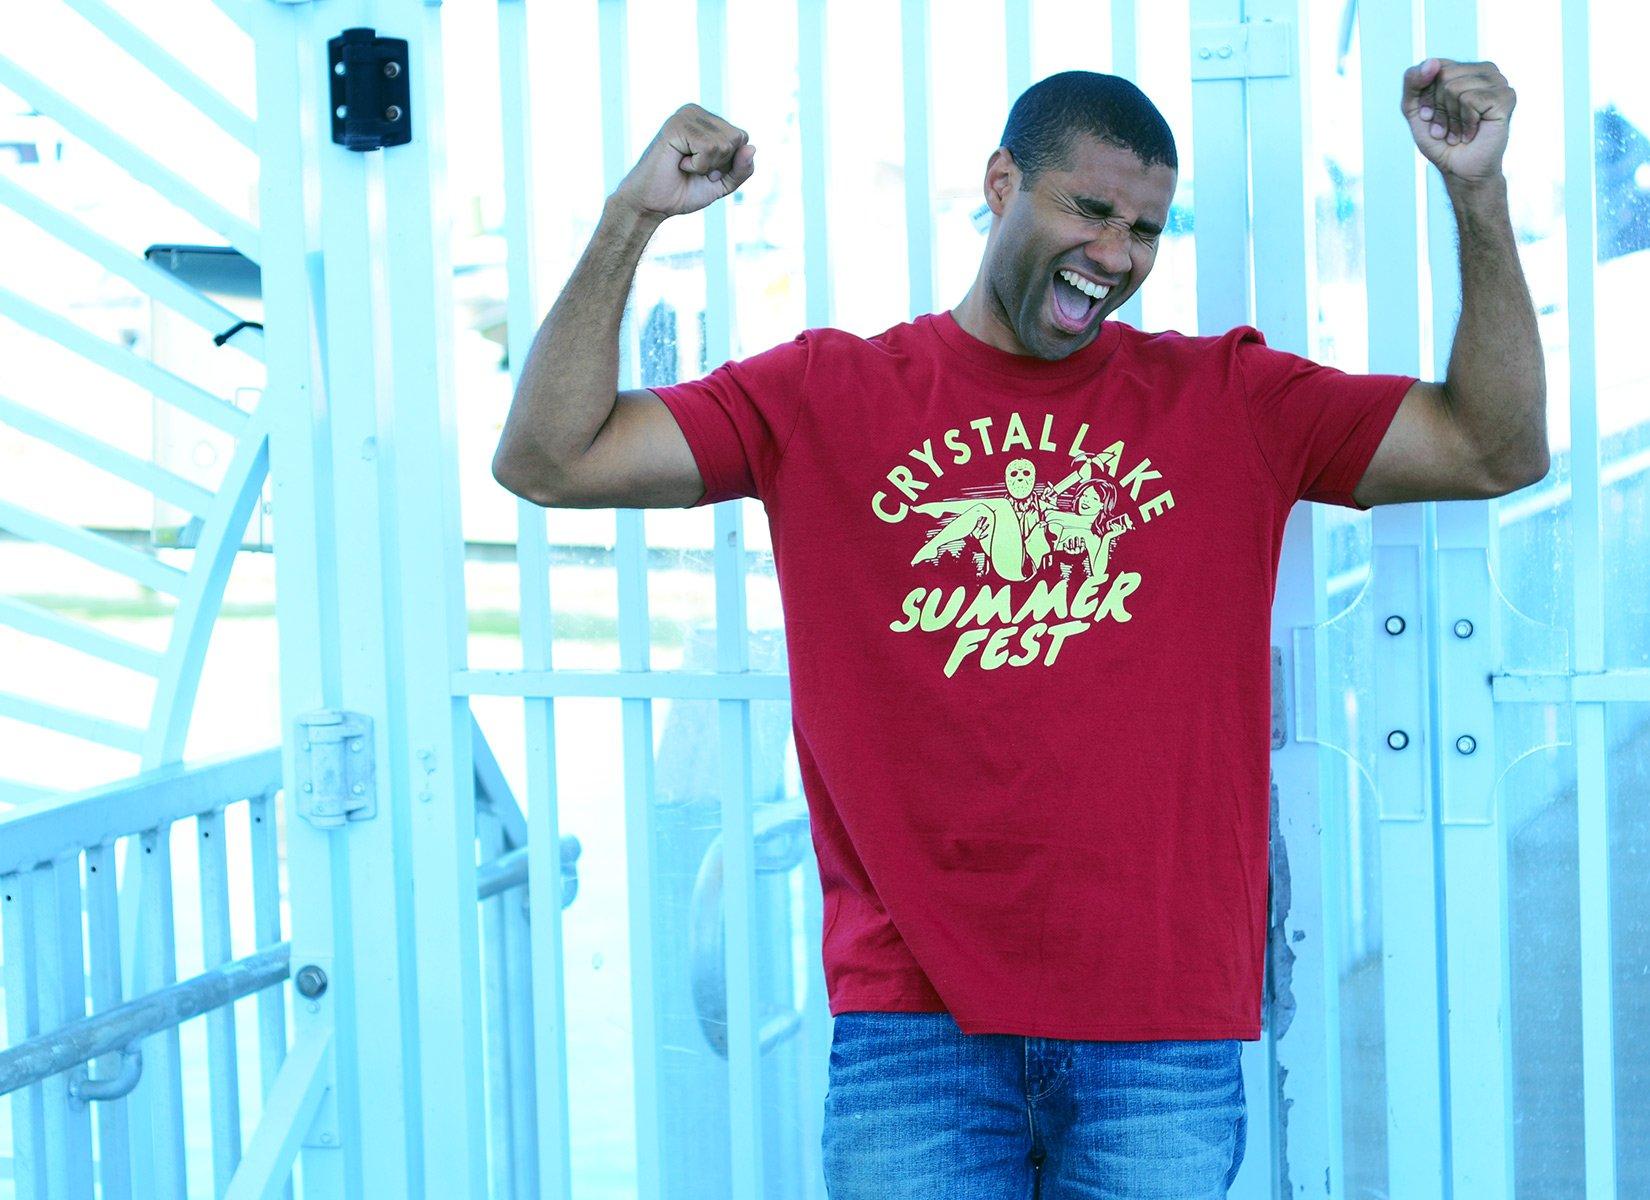 Crystal Lake Summer Fest on Mens T-Shirt